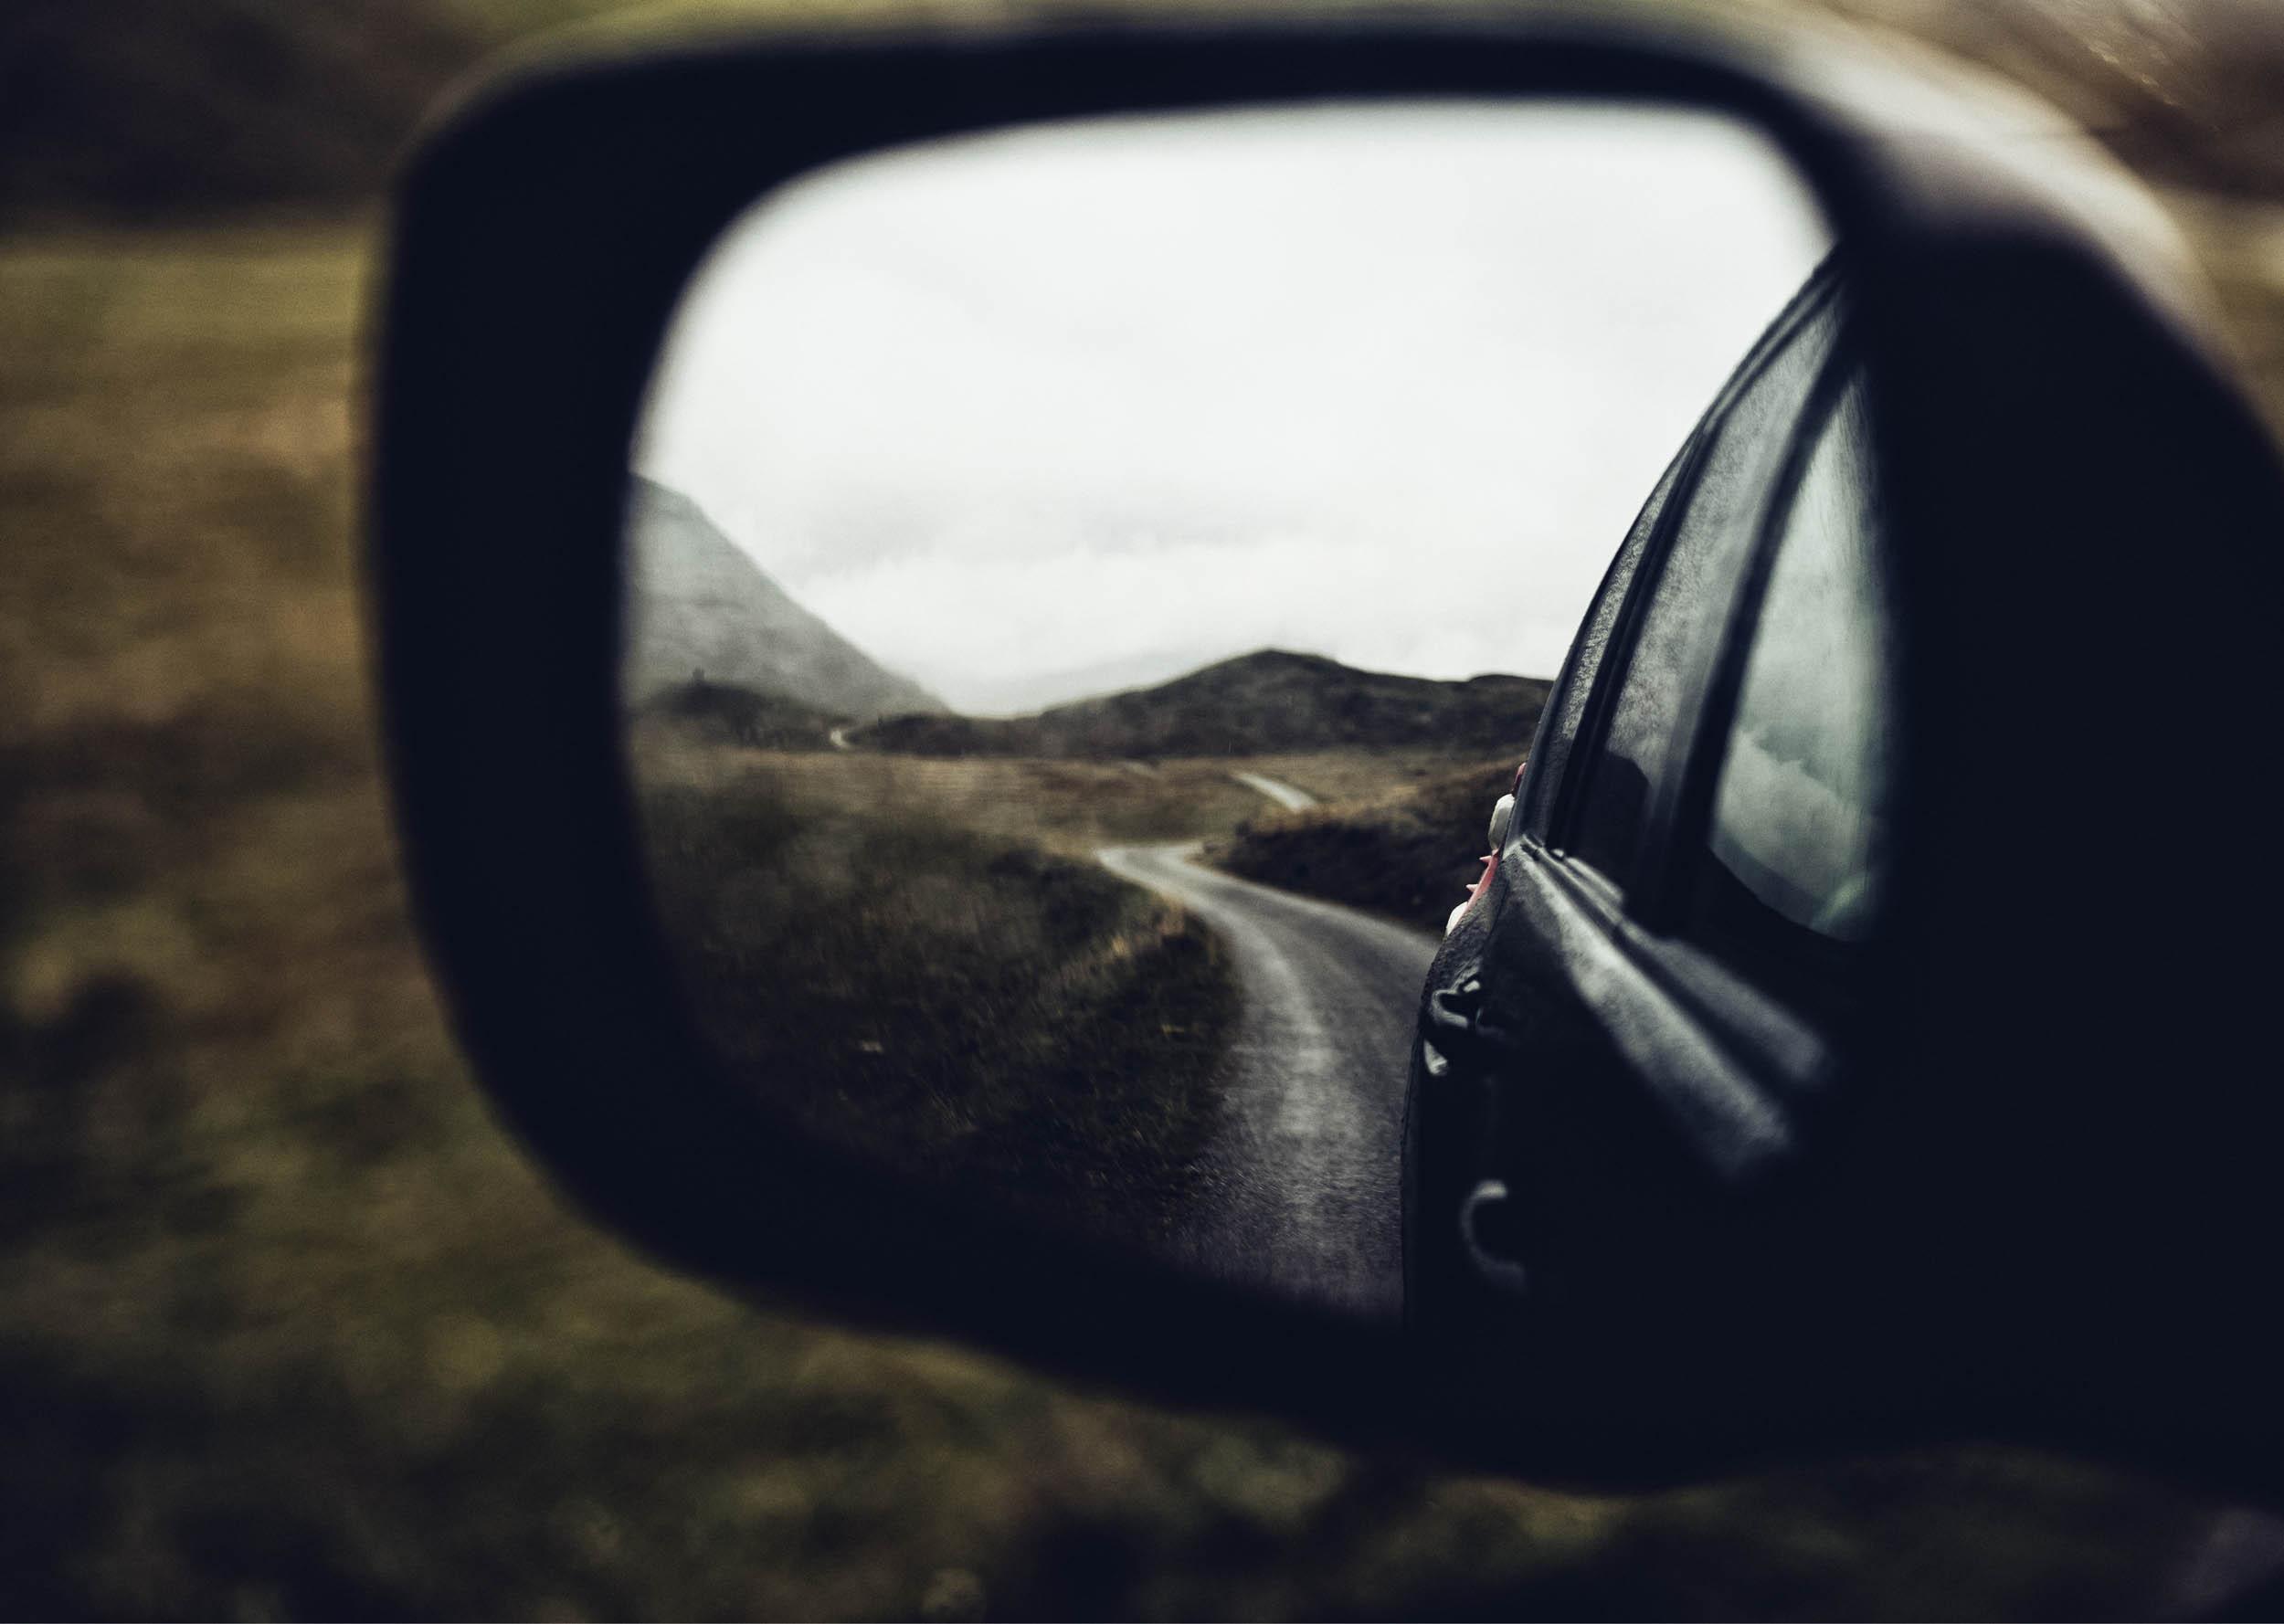 seifertuebler-landscape-toyota-landcruiser-automotive-04.jpg